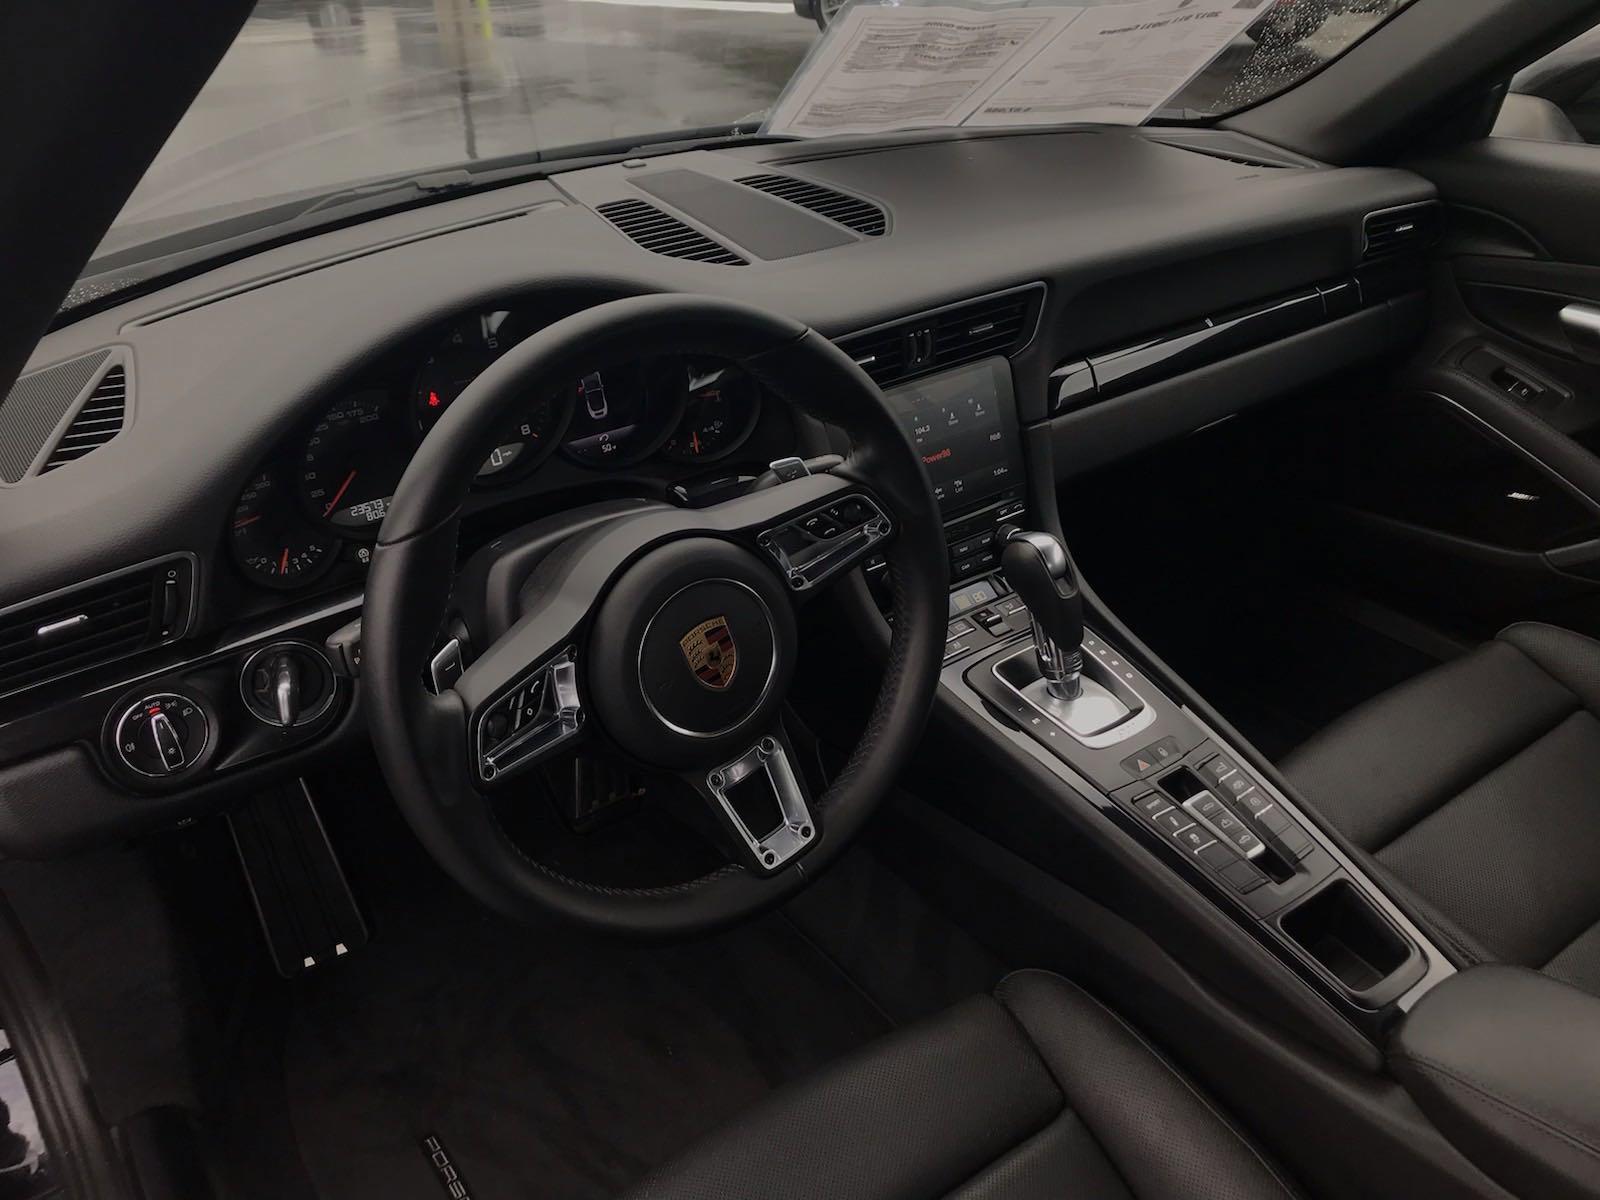 Pre-Owned 2017 Porsche 911 Carrera Cabriolet